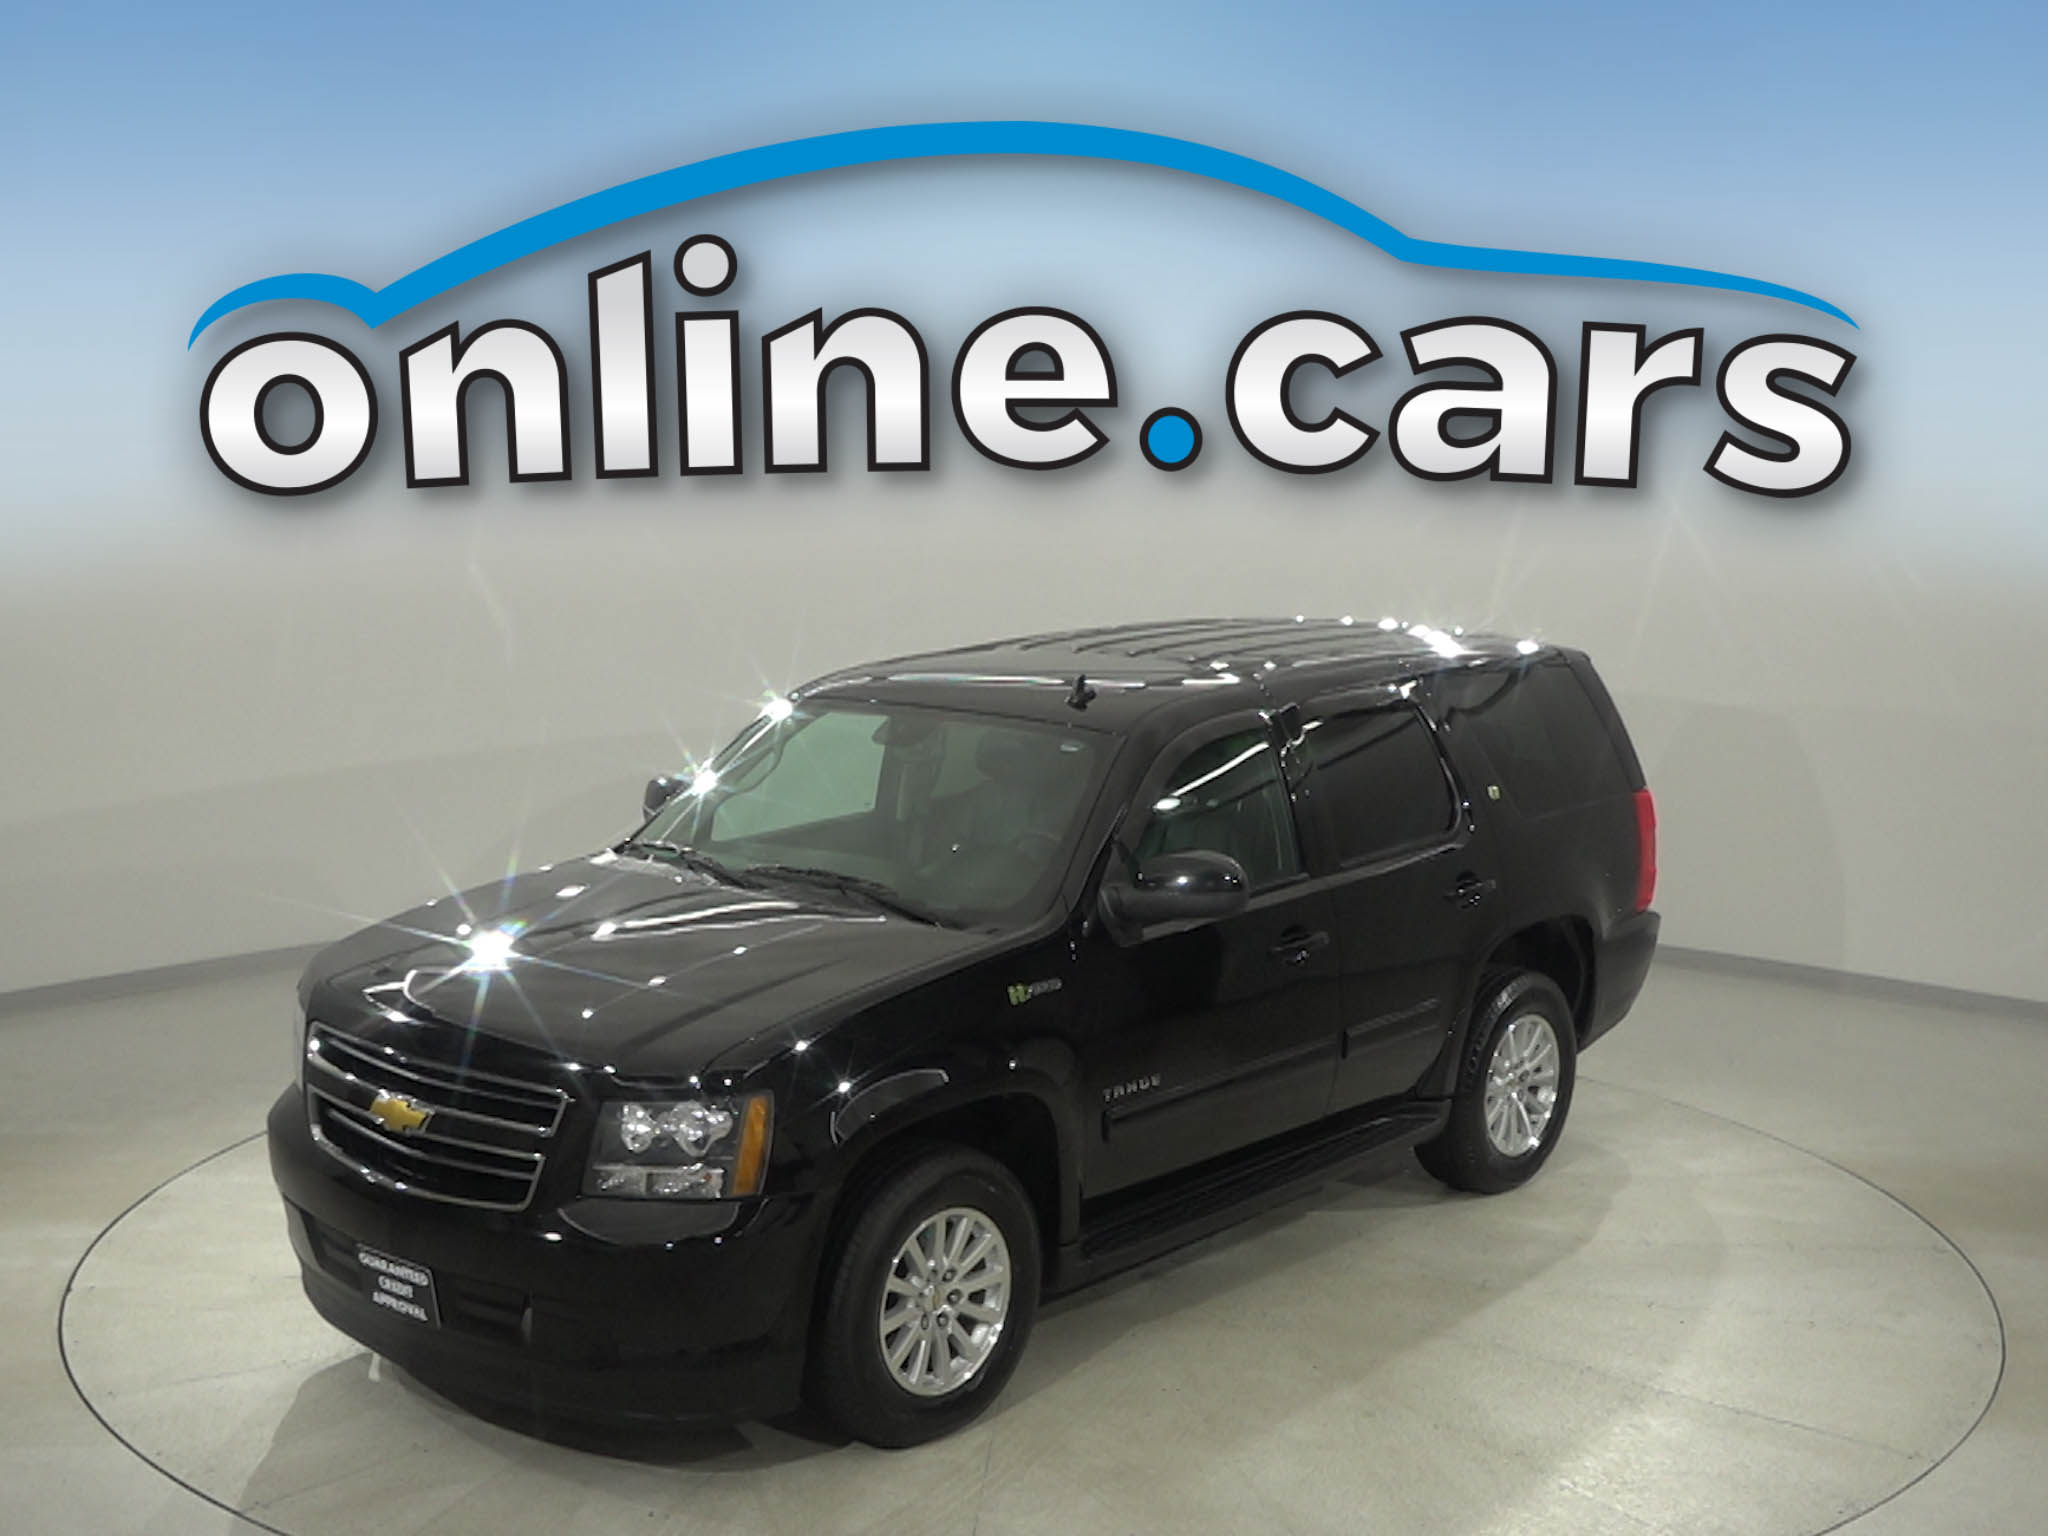 Pre-Owned 2012 Chevrolet Tahoe Hybrid